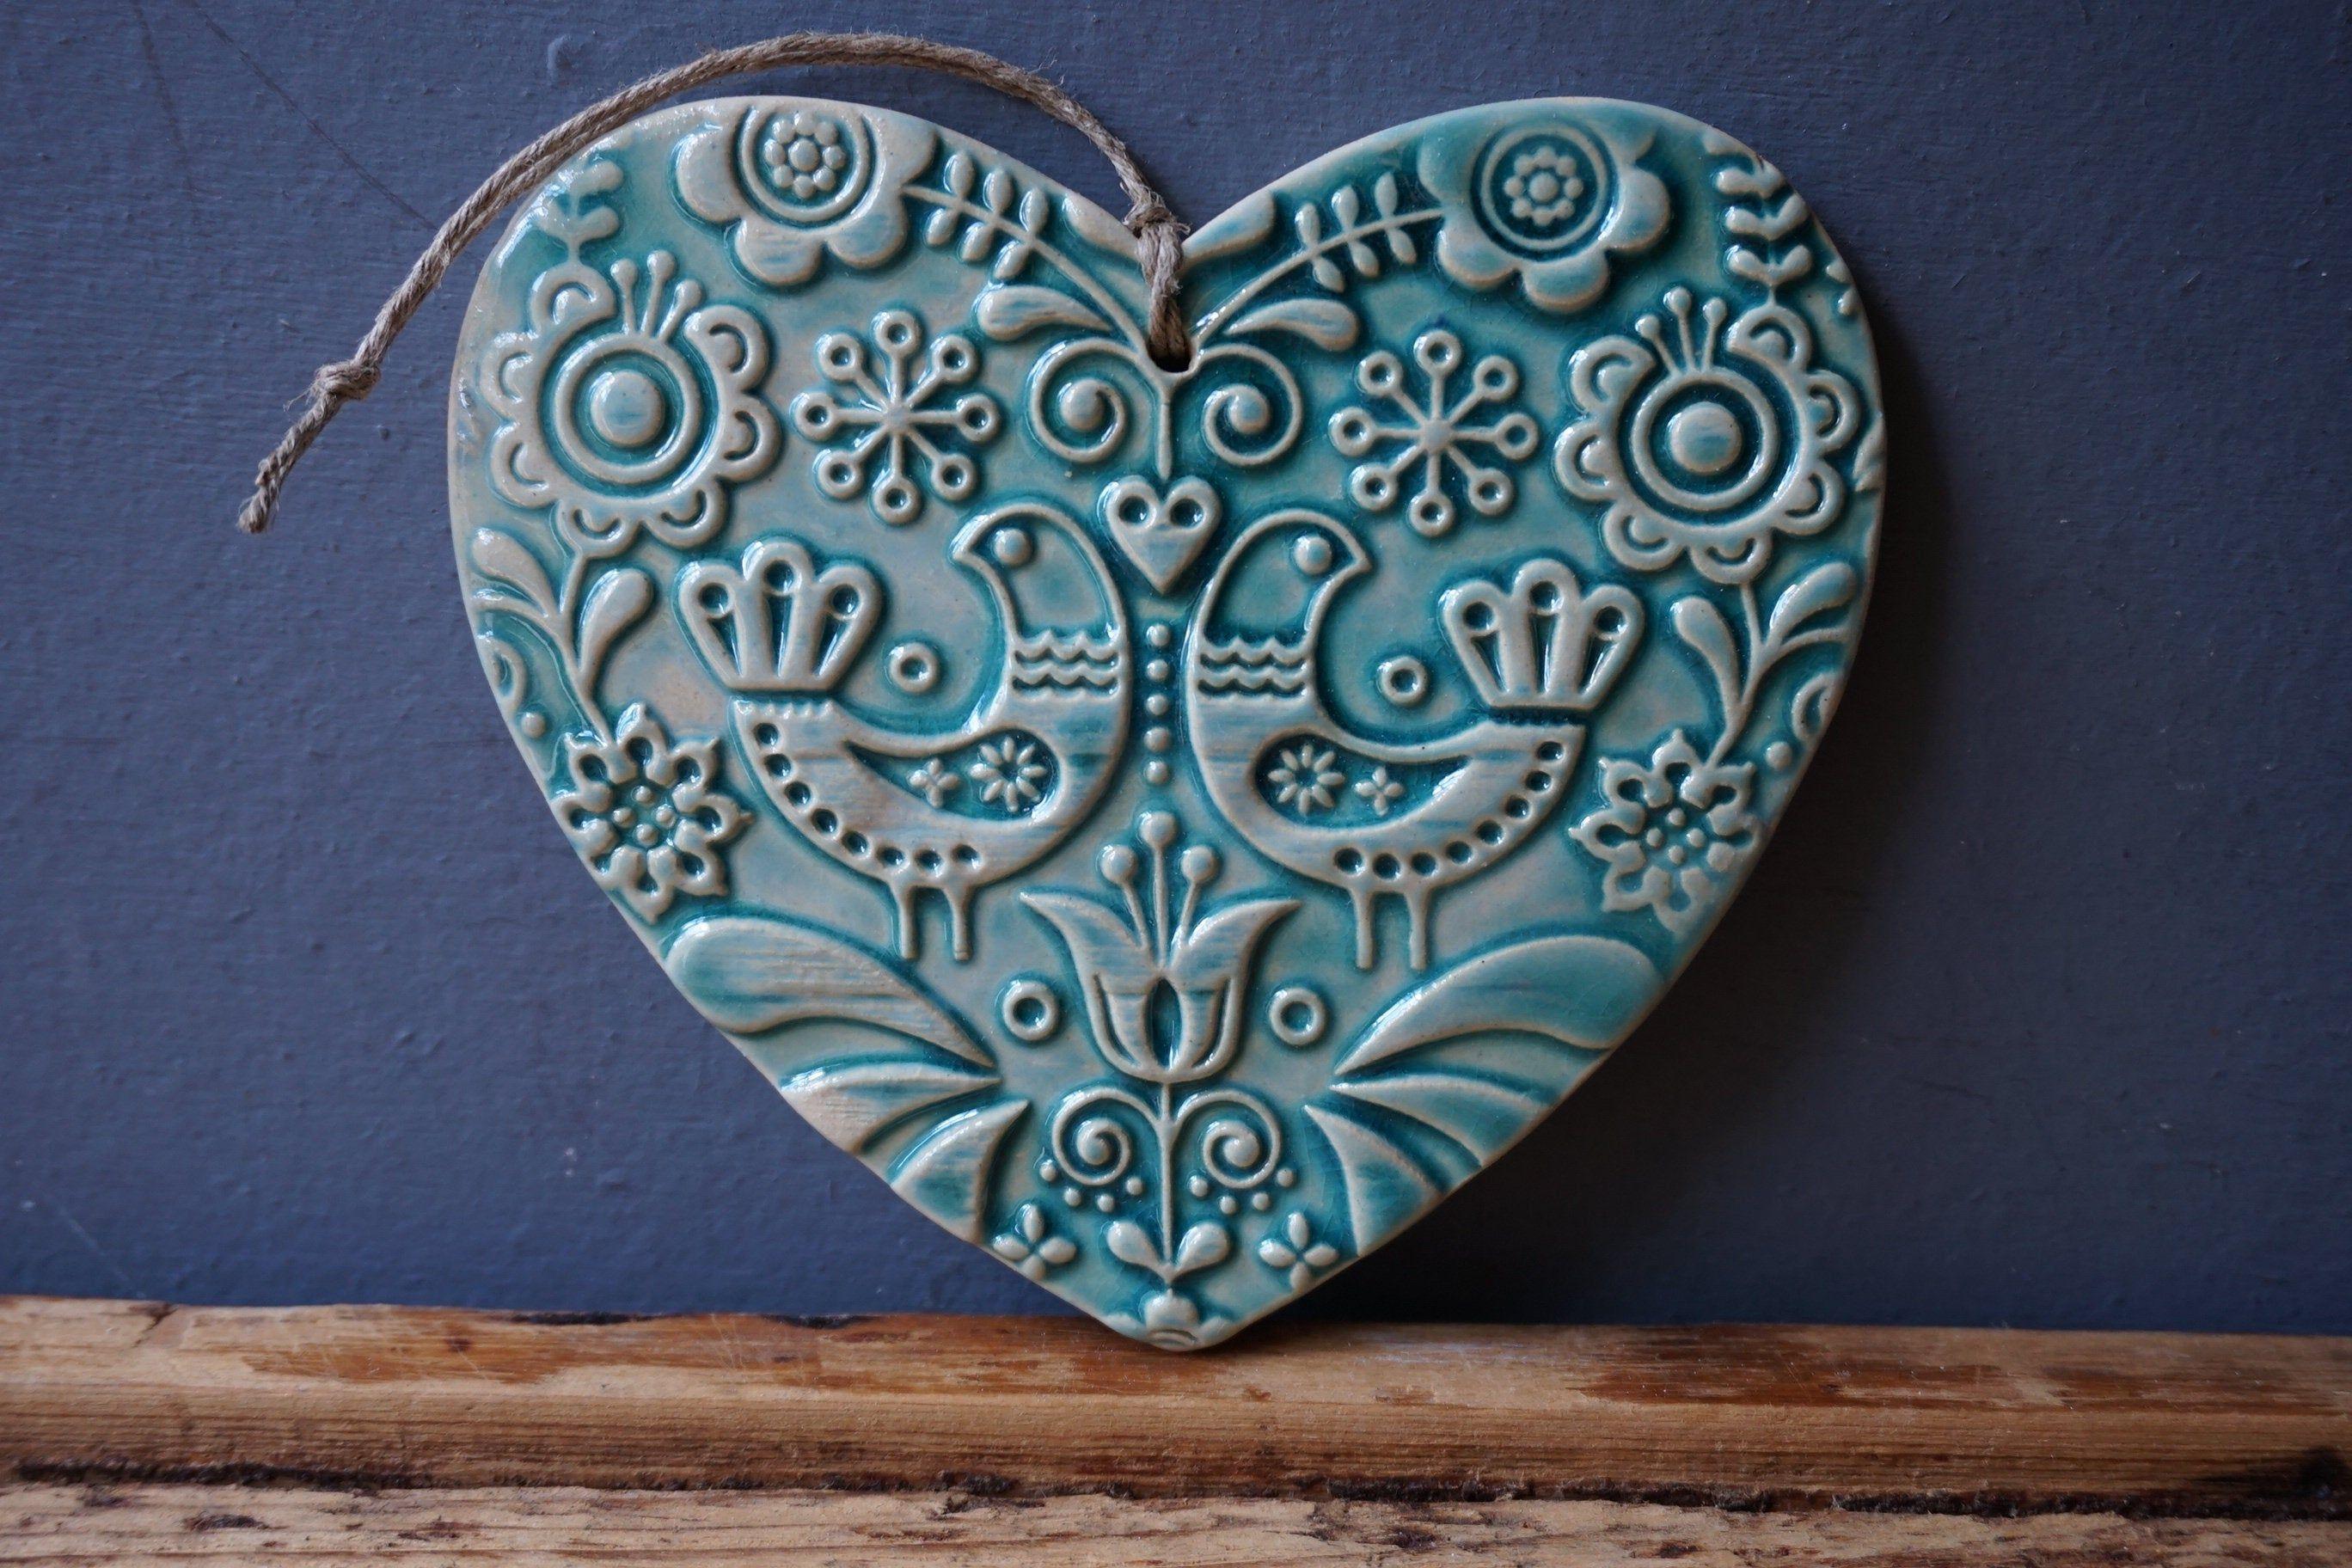 Handmade Gift Idea |Folk Art Light Mint Heart Ornament Summer Decor Party Favor |Tree Ornament Nautical Decor #3